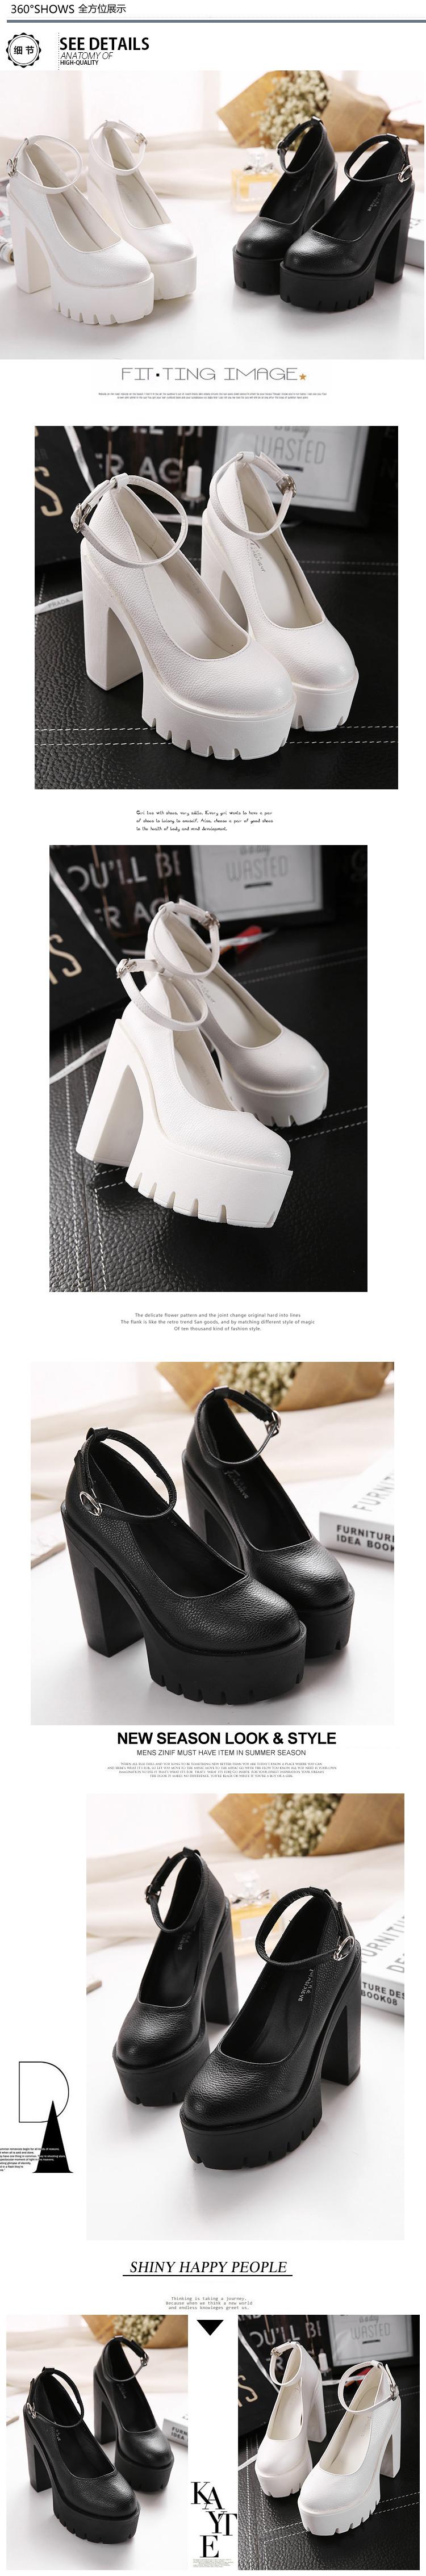 2016 new fashion high heels platform pump women shoes ruslana korshunova thick heels shoes women high heels